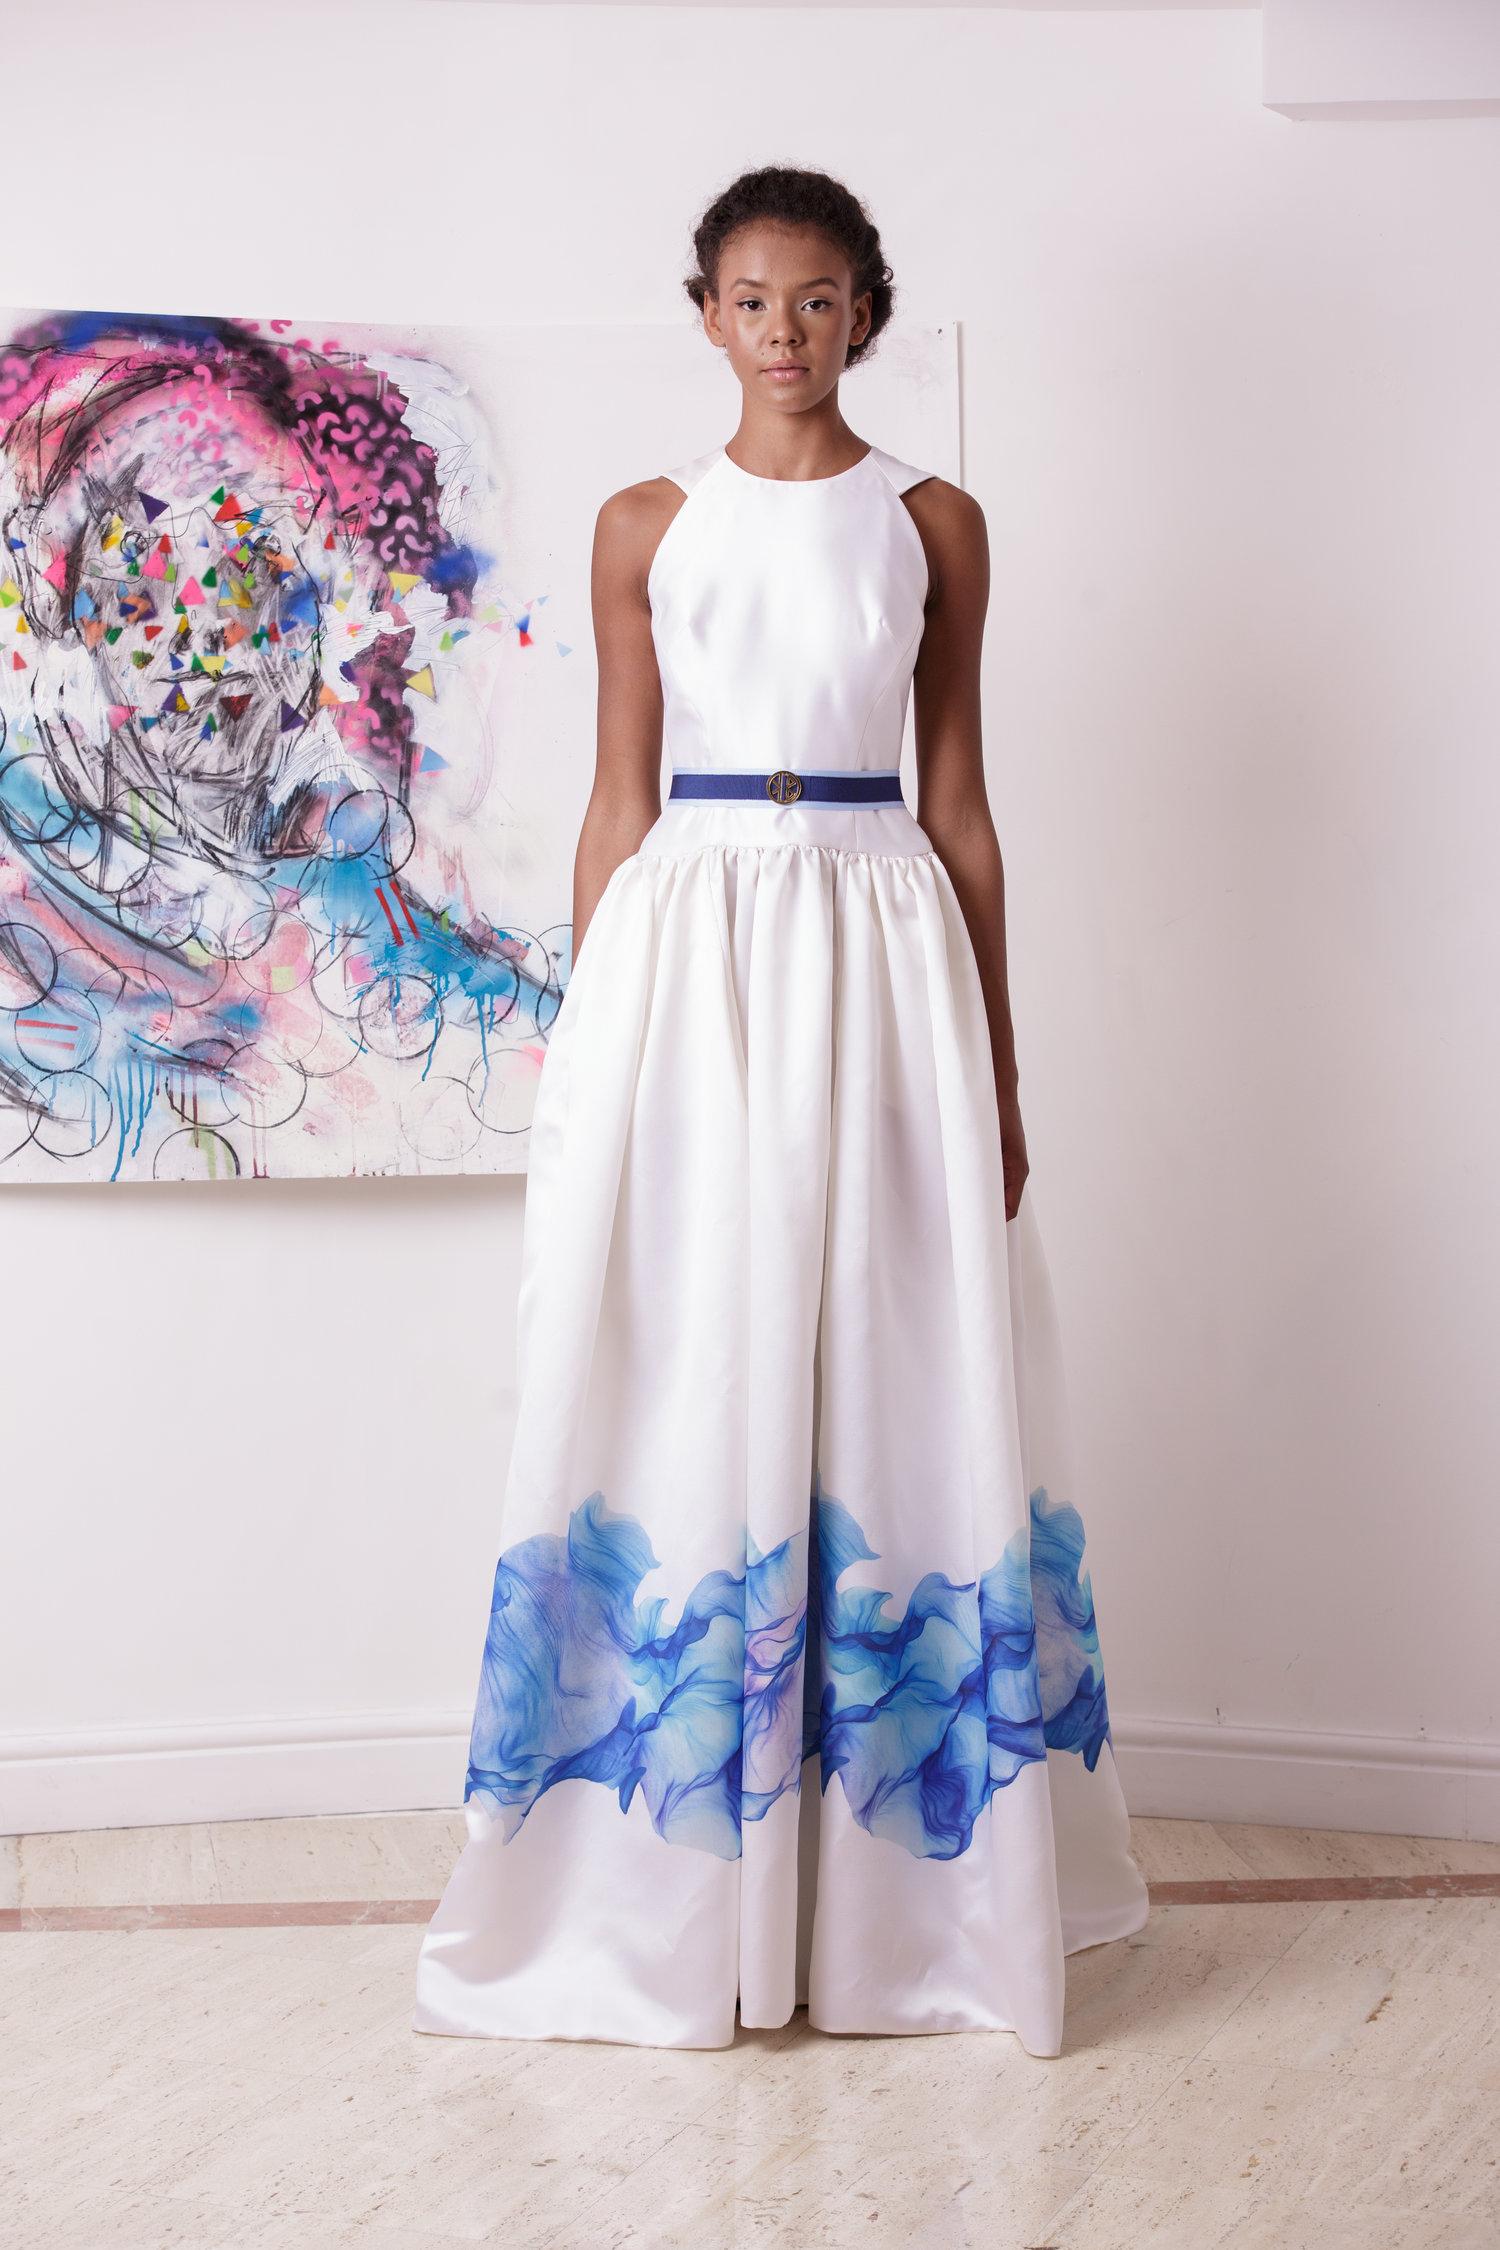 White Silk Wedding Gown With Sky Bordered Skirt — Kolchagov Barba